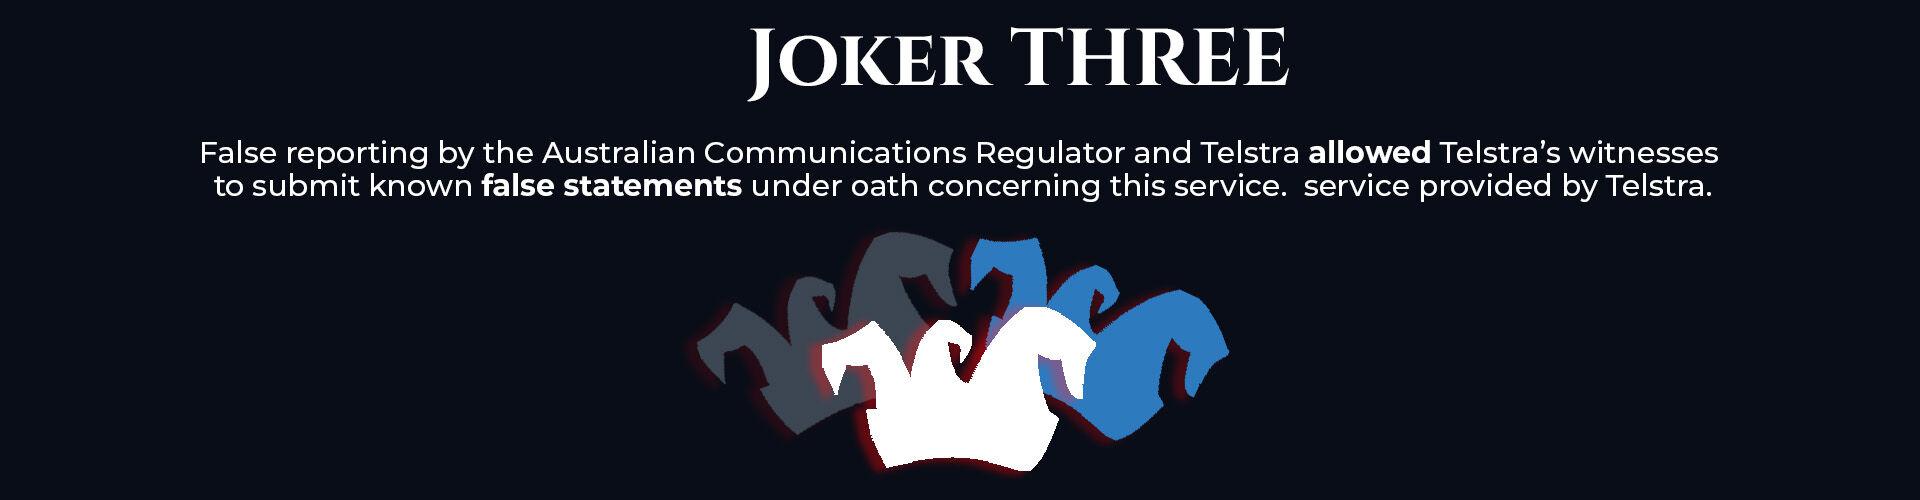 Absent Justice - My Story - Joker Three